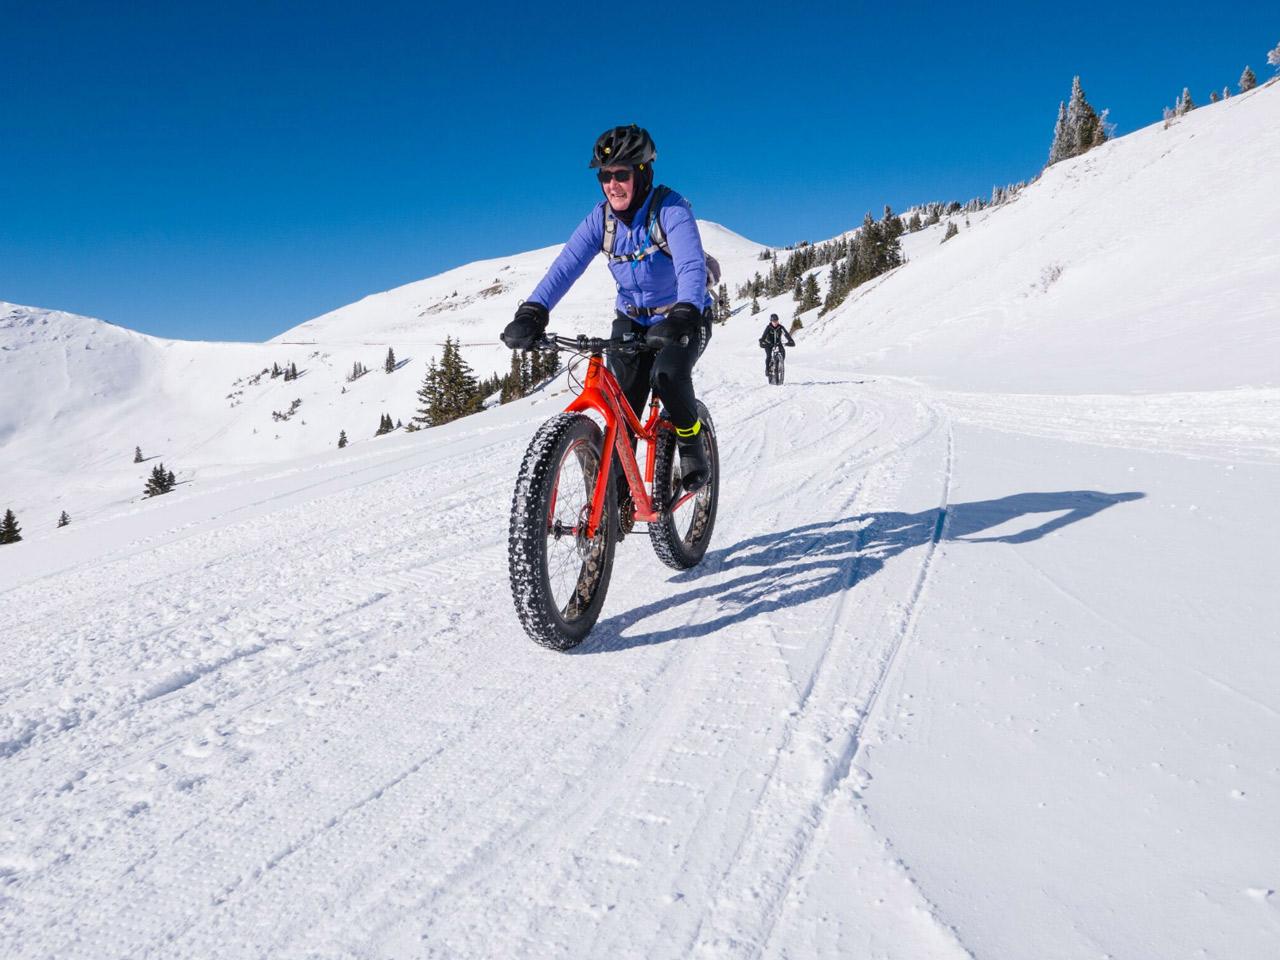 RBR_cottonwood-pass-summit_13